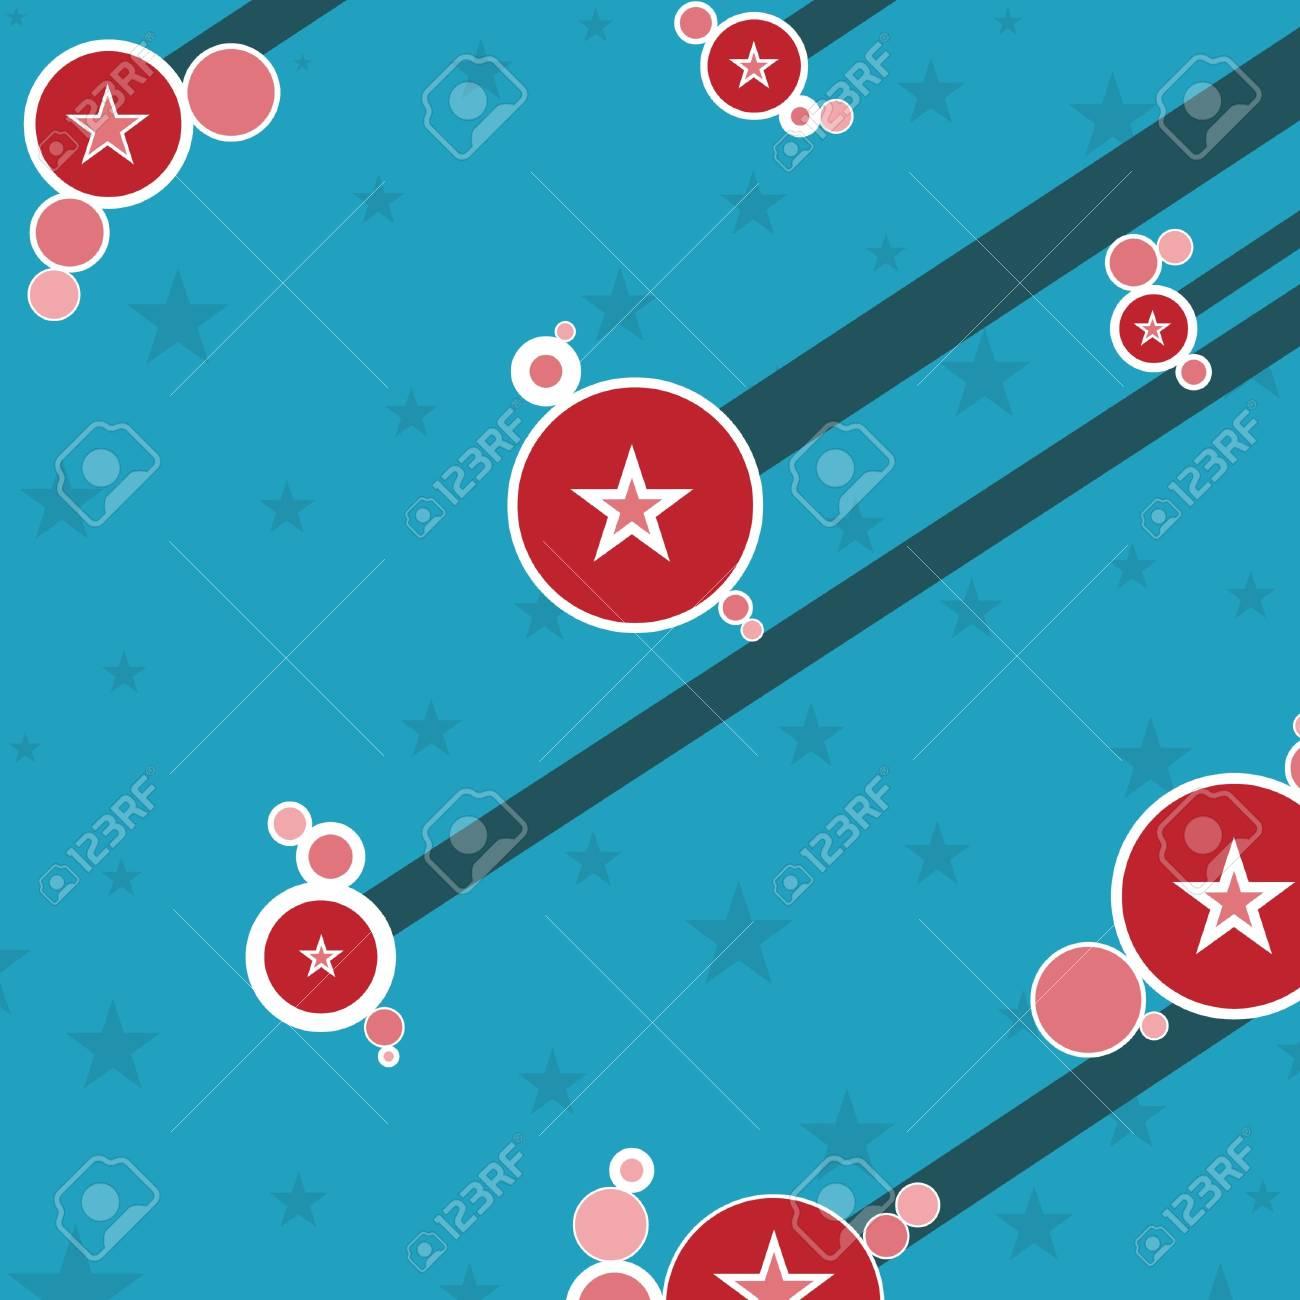 Abstract Retro circles and stars Stock Photo - 2459632